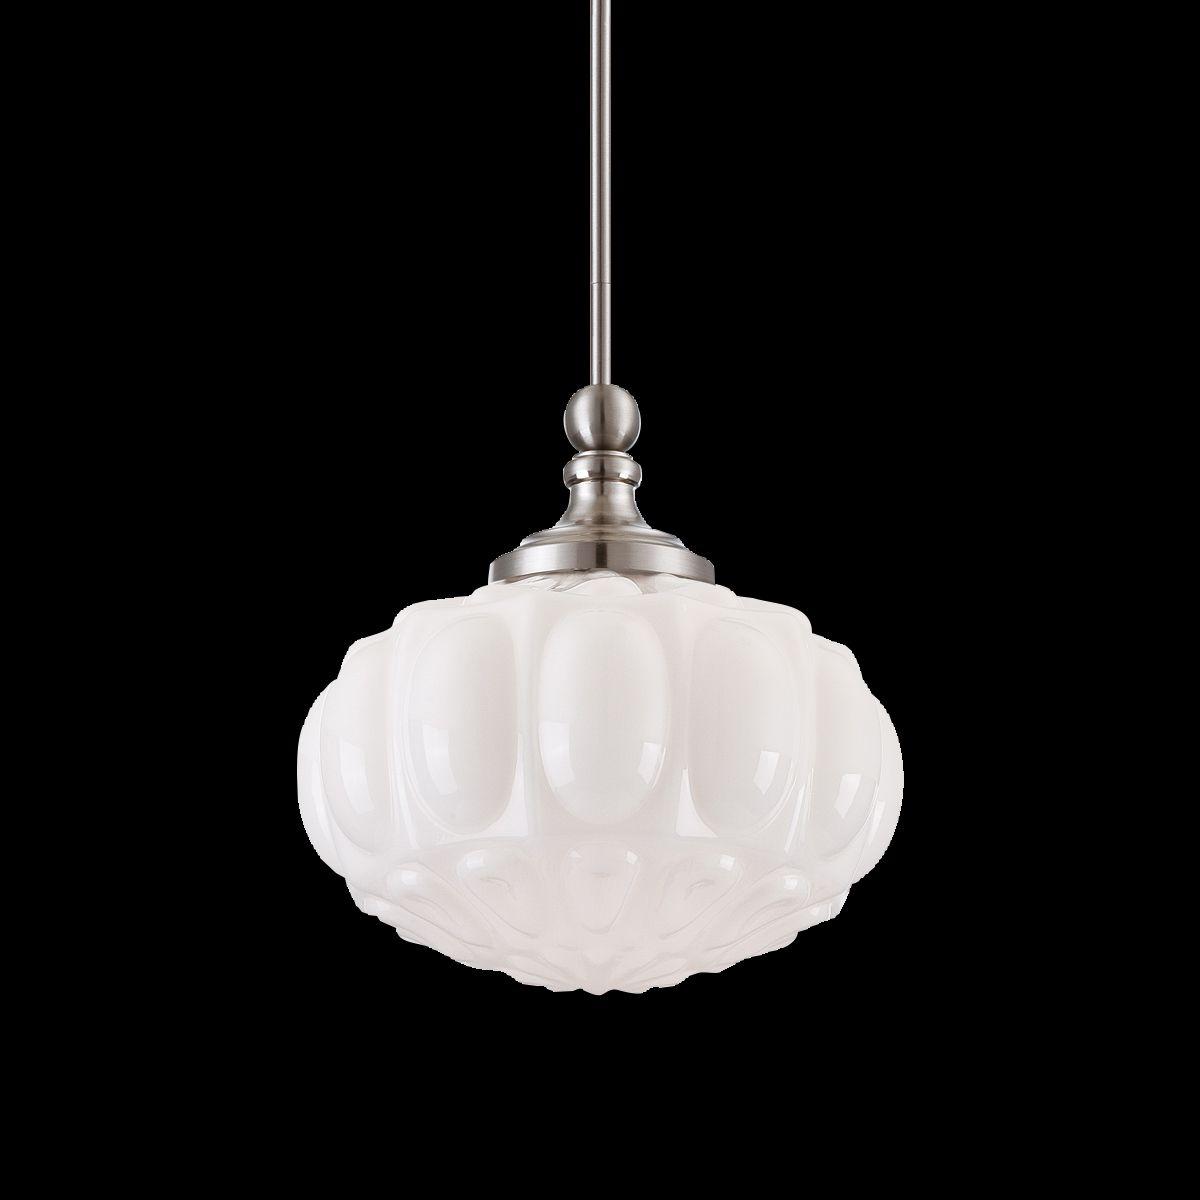 Eurofase lighting products muso kitchen lighting